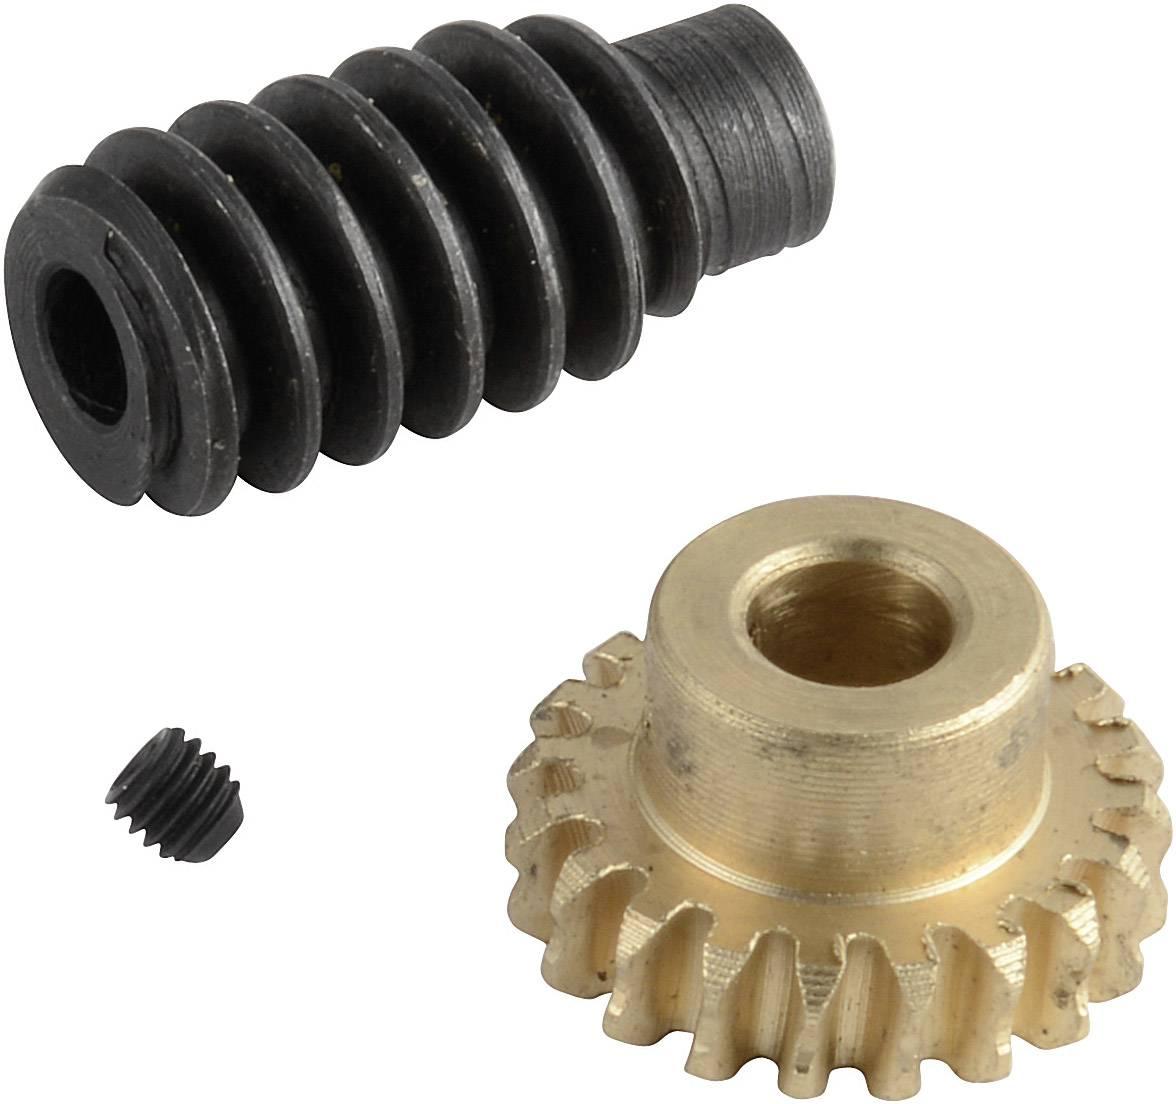 20 20 1 Paar Stahl-Kegelrad Reely  Modul-Typ 0.5 Anzahl Zähne